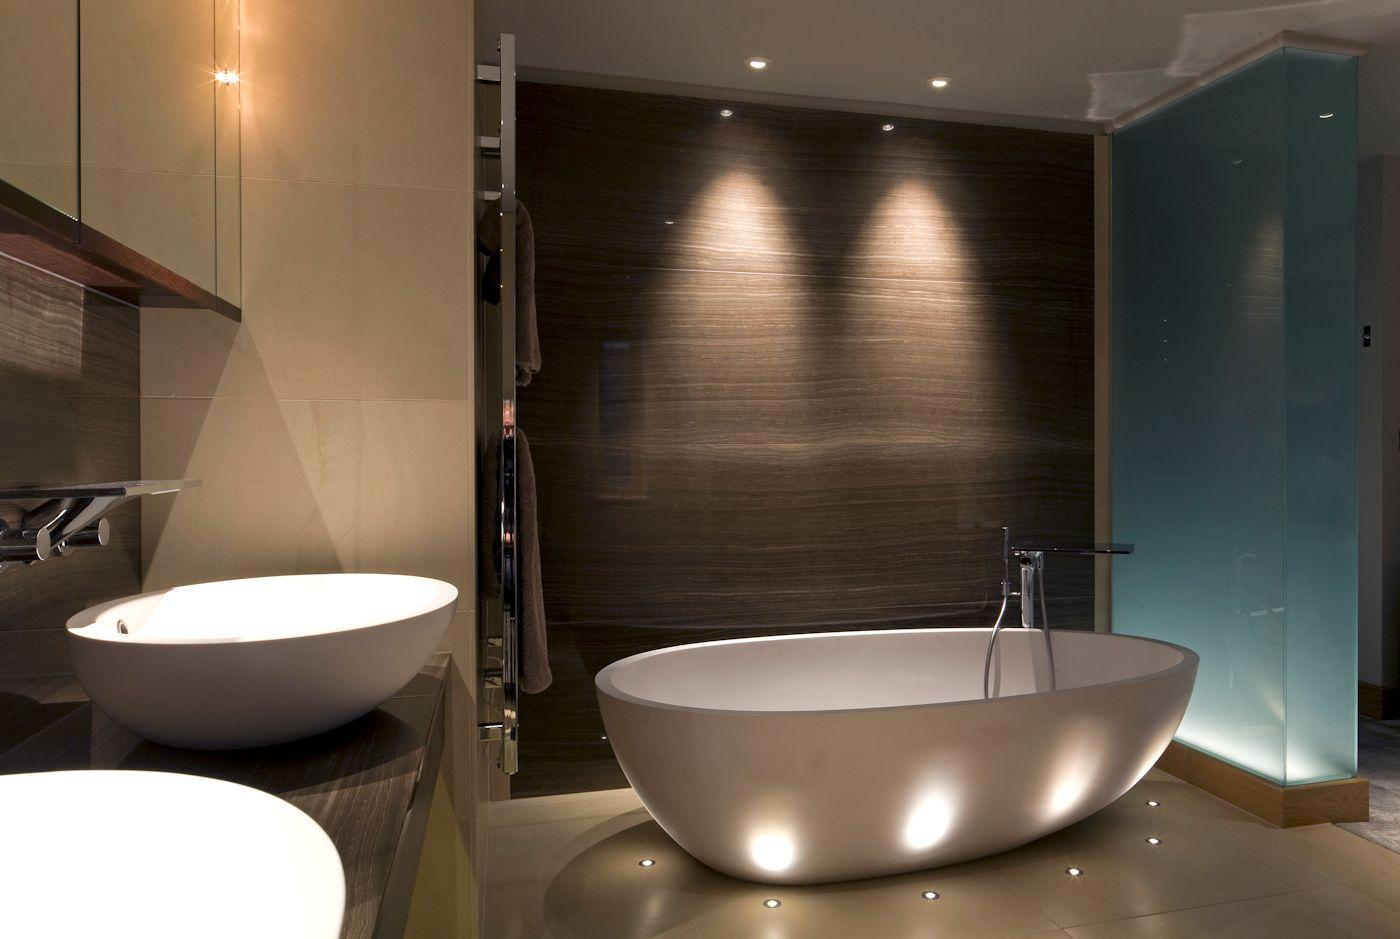 Bathroom Spotlights Design Bathhroom Accessories inside size 1400 X 939